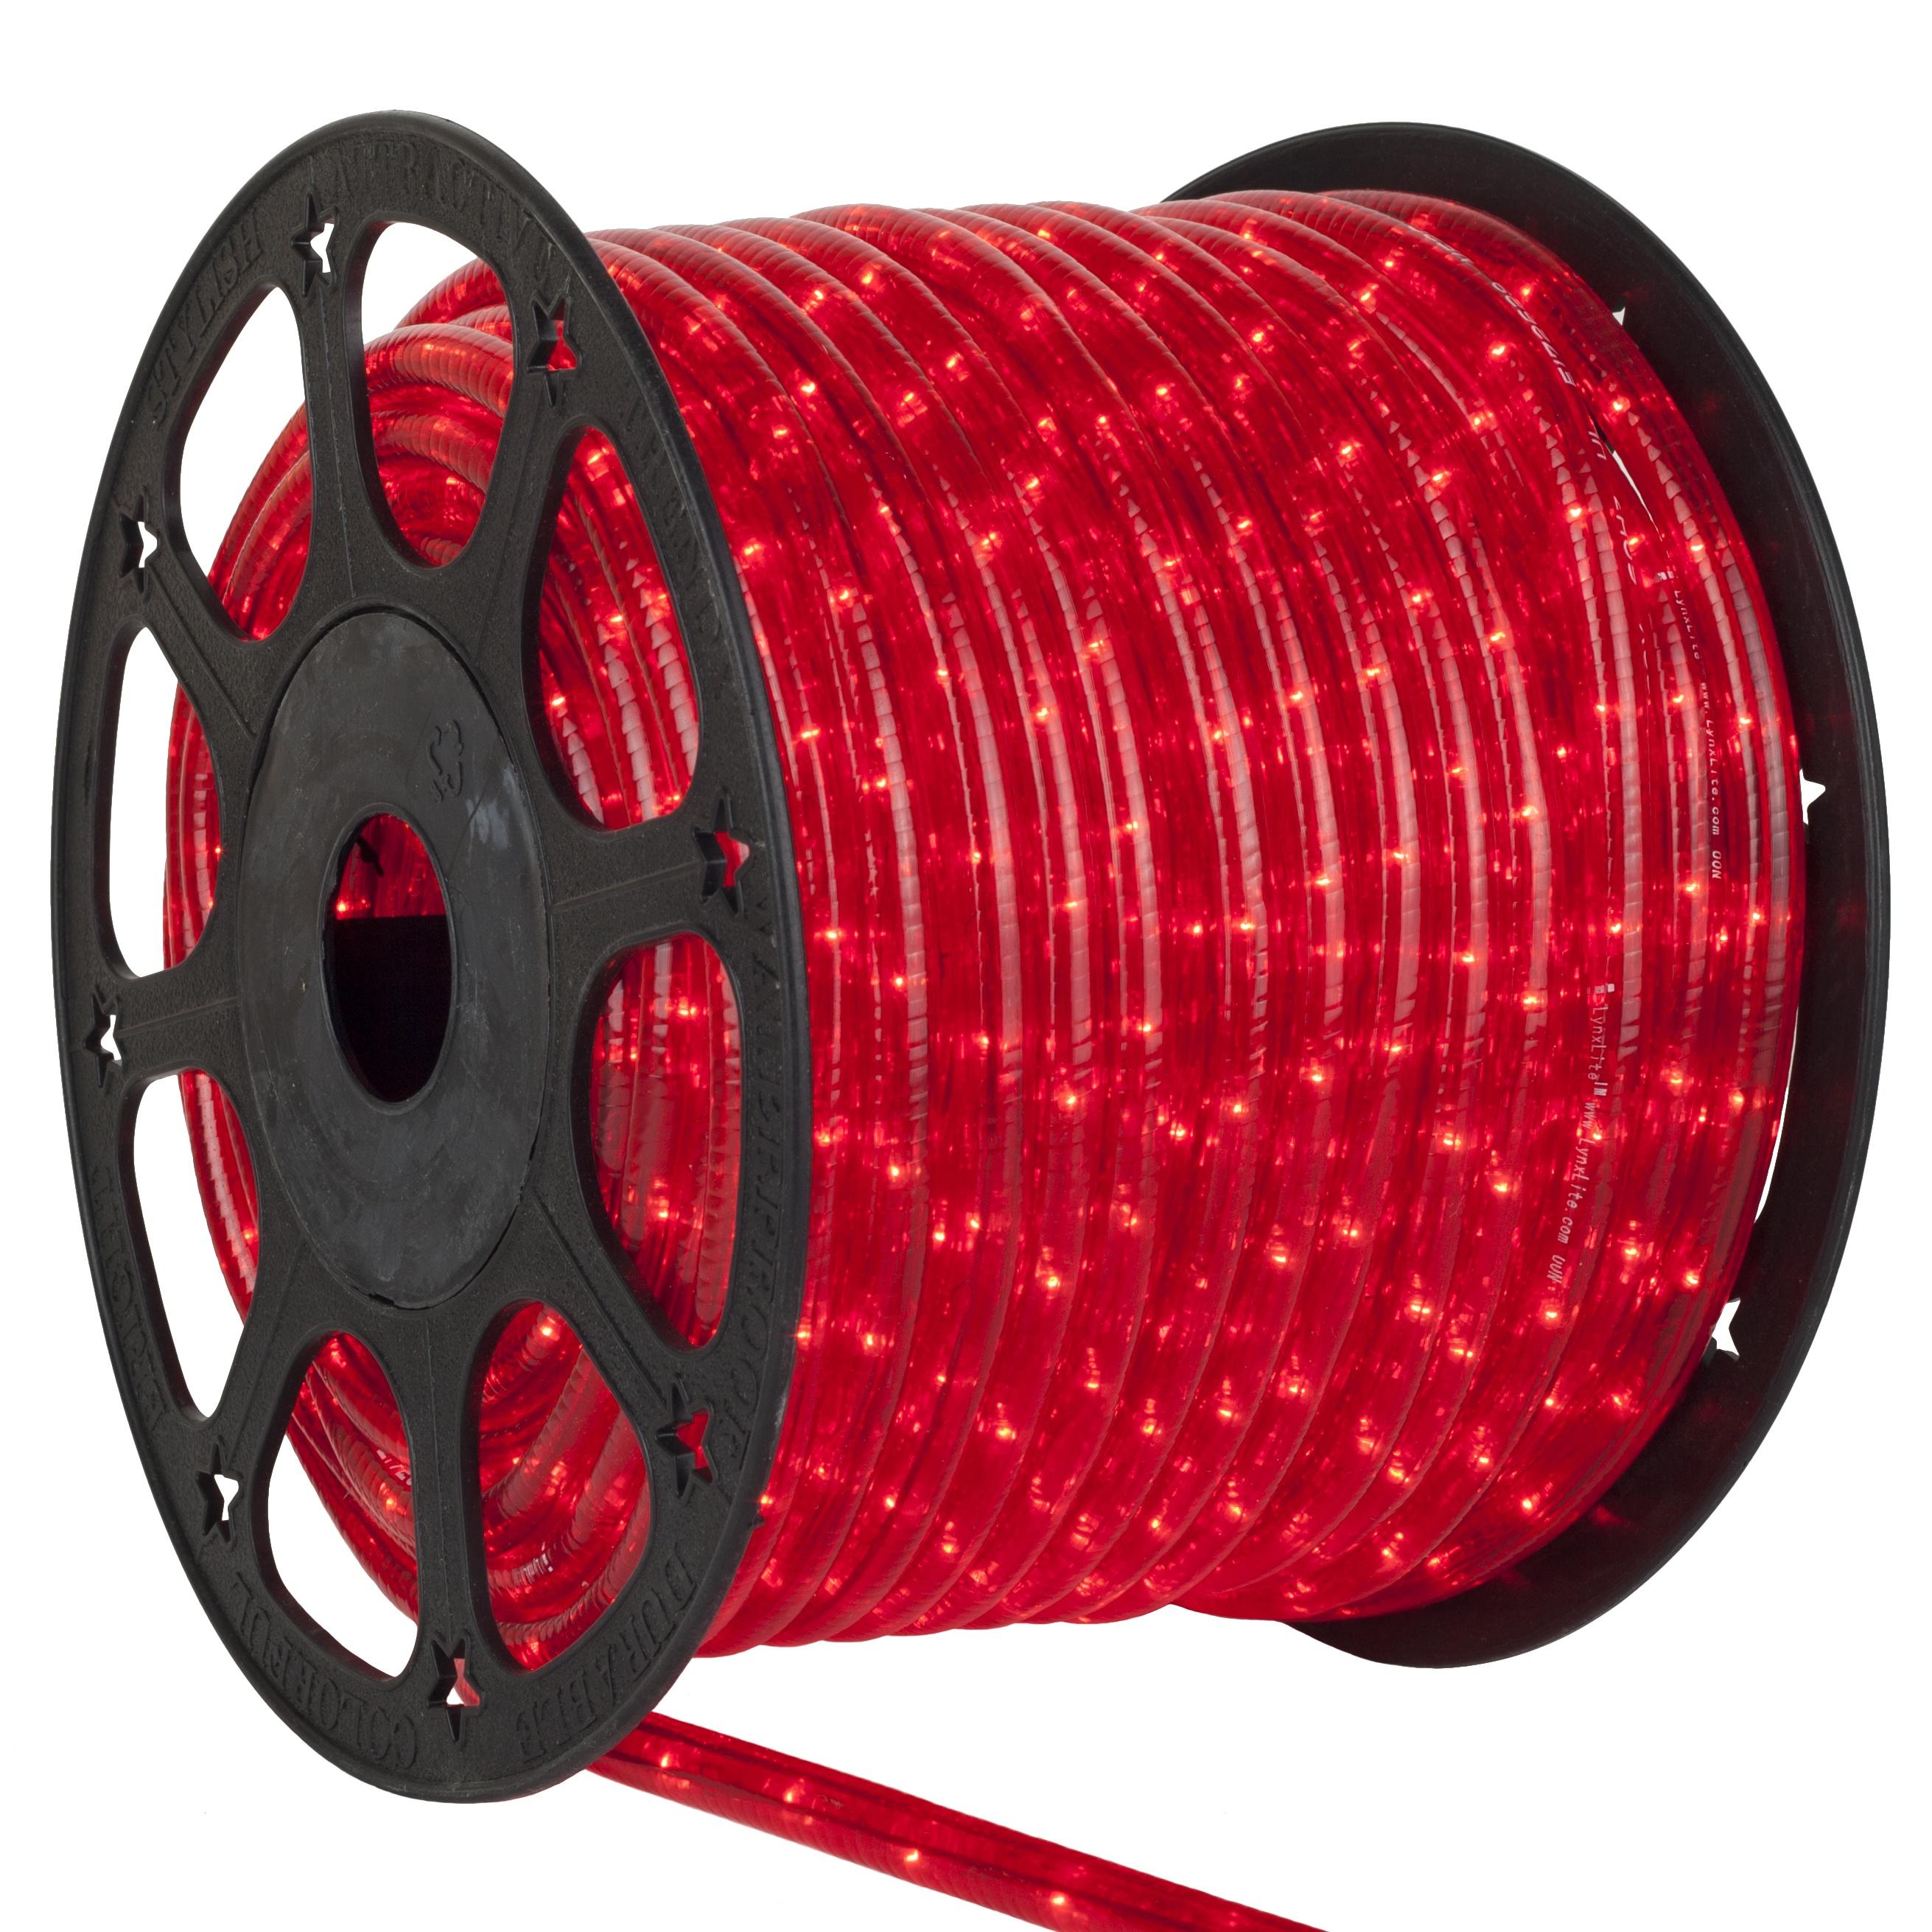 Rope Light 150 Red Mini Rope Light Commercial Spool